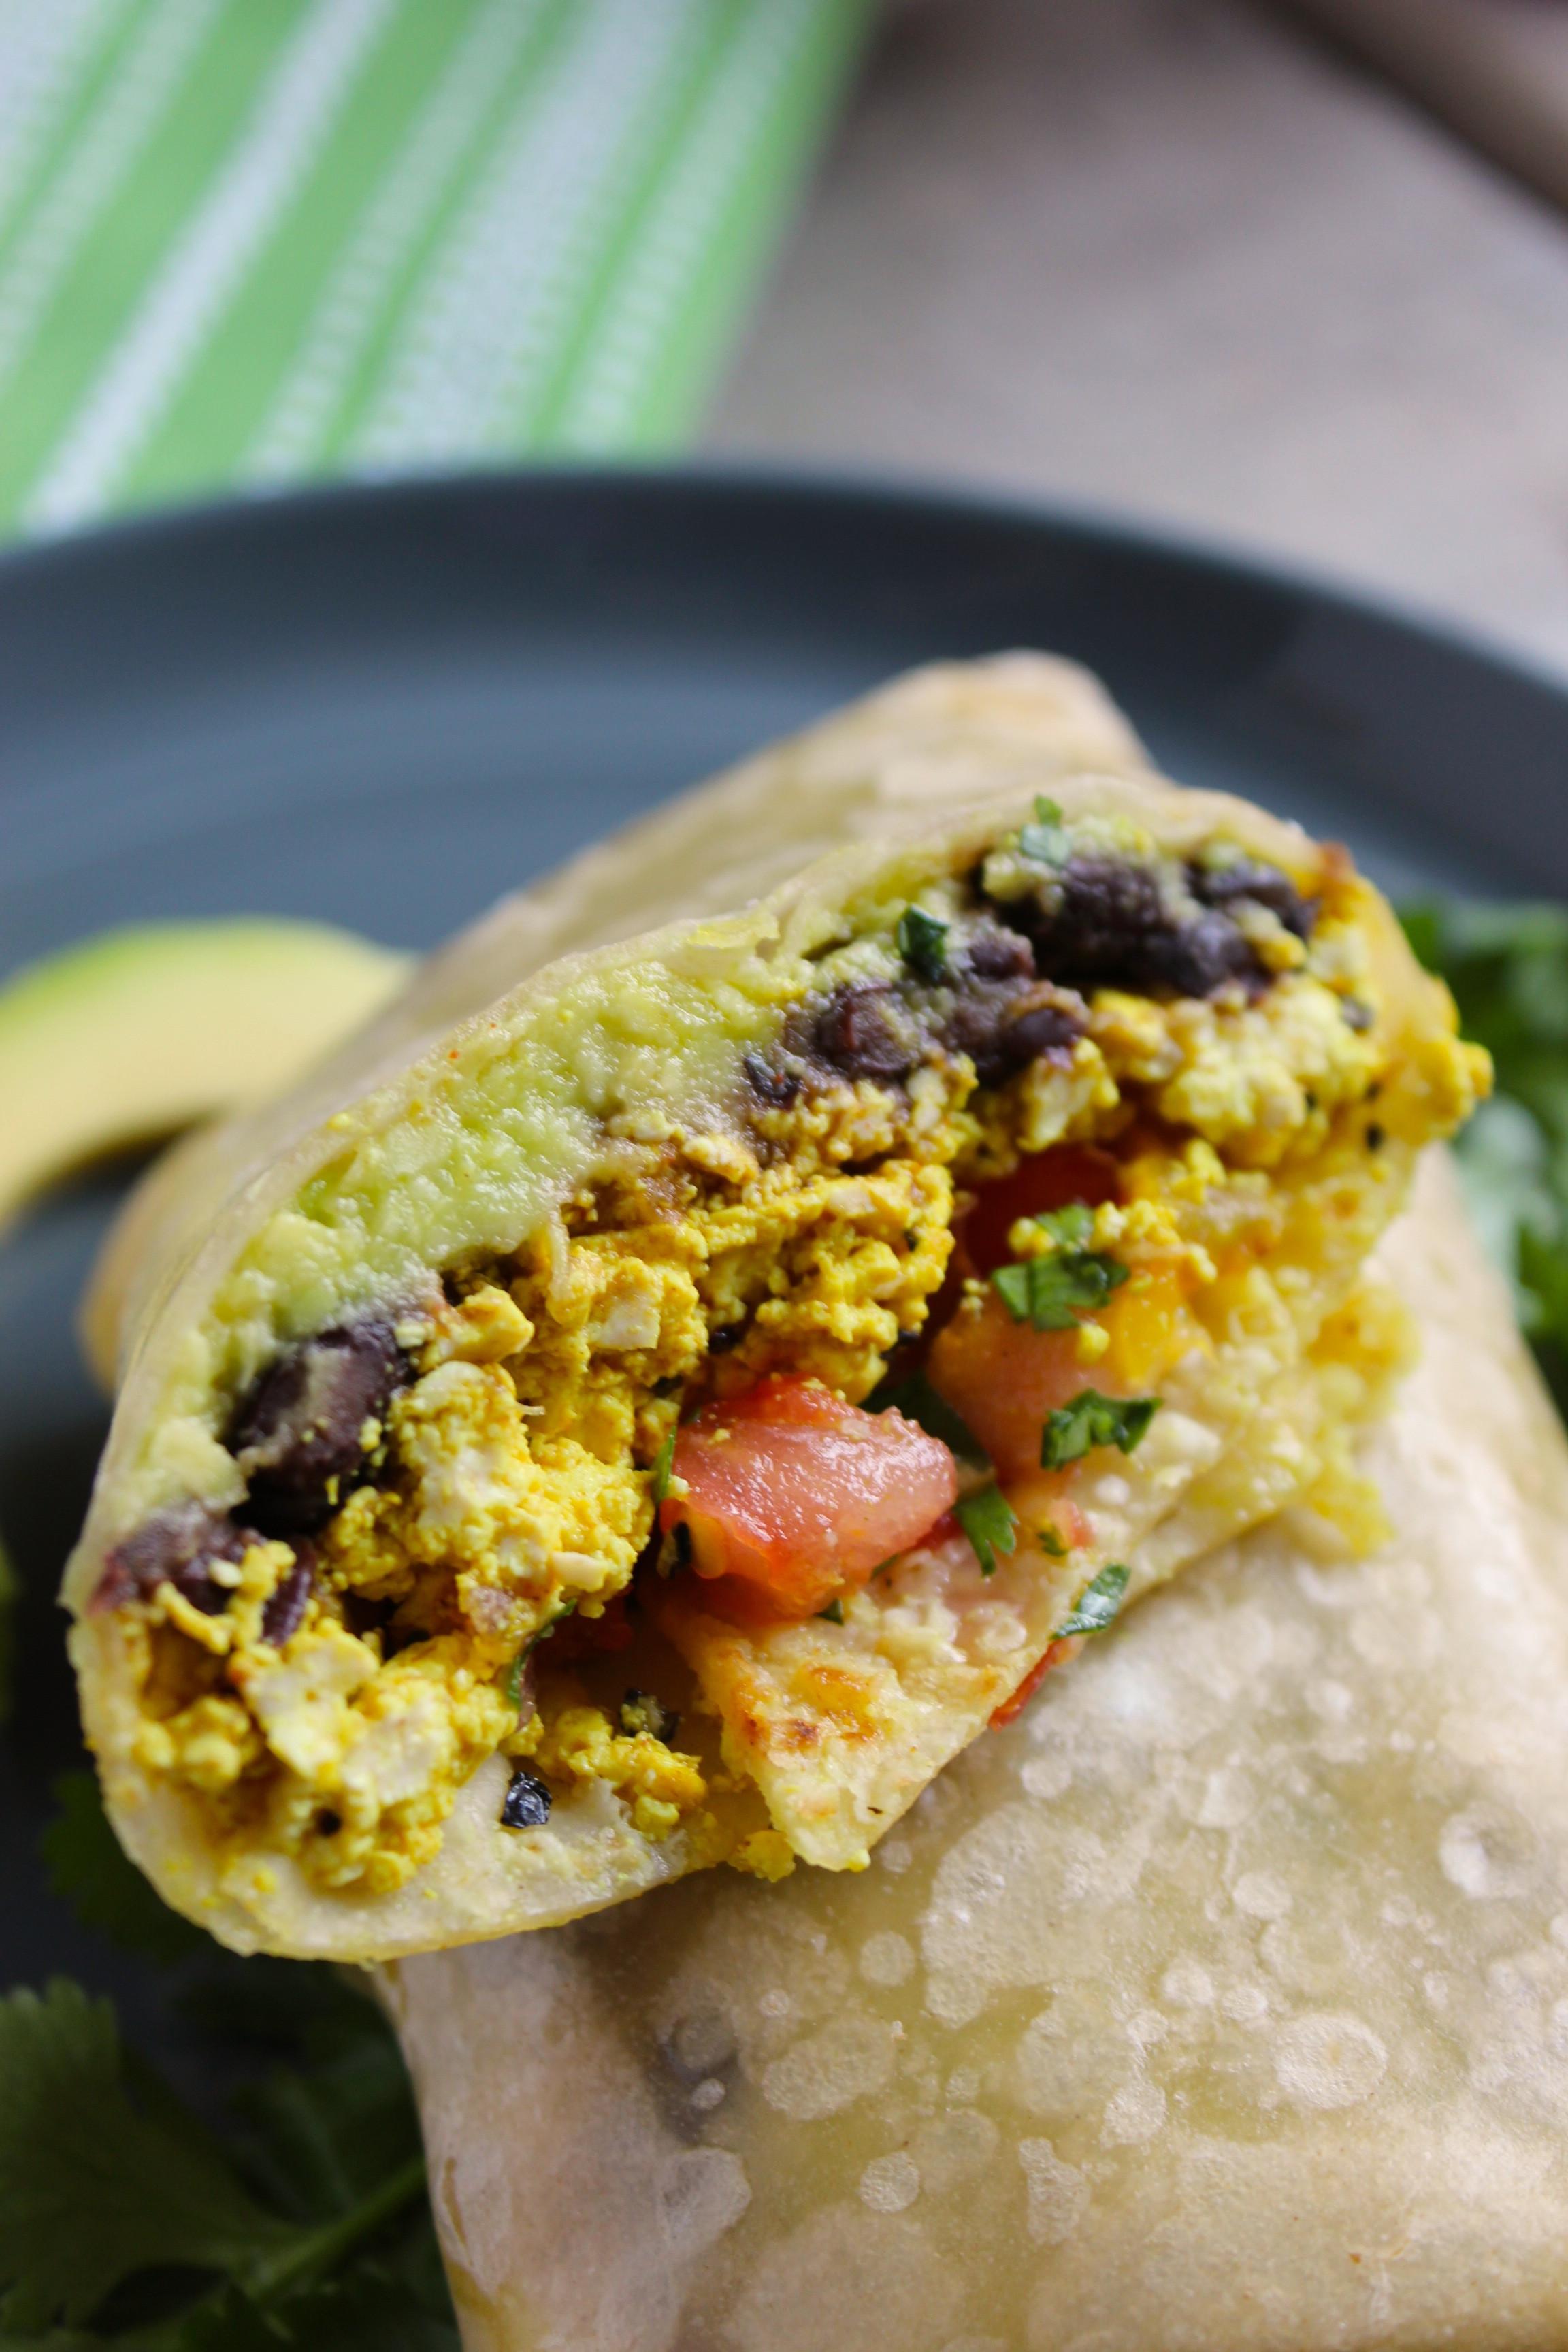 Healthy Breakfast Burrito  Healthy Tofu Breakfast Burritos The Fitchen